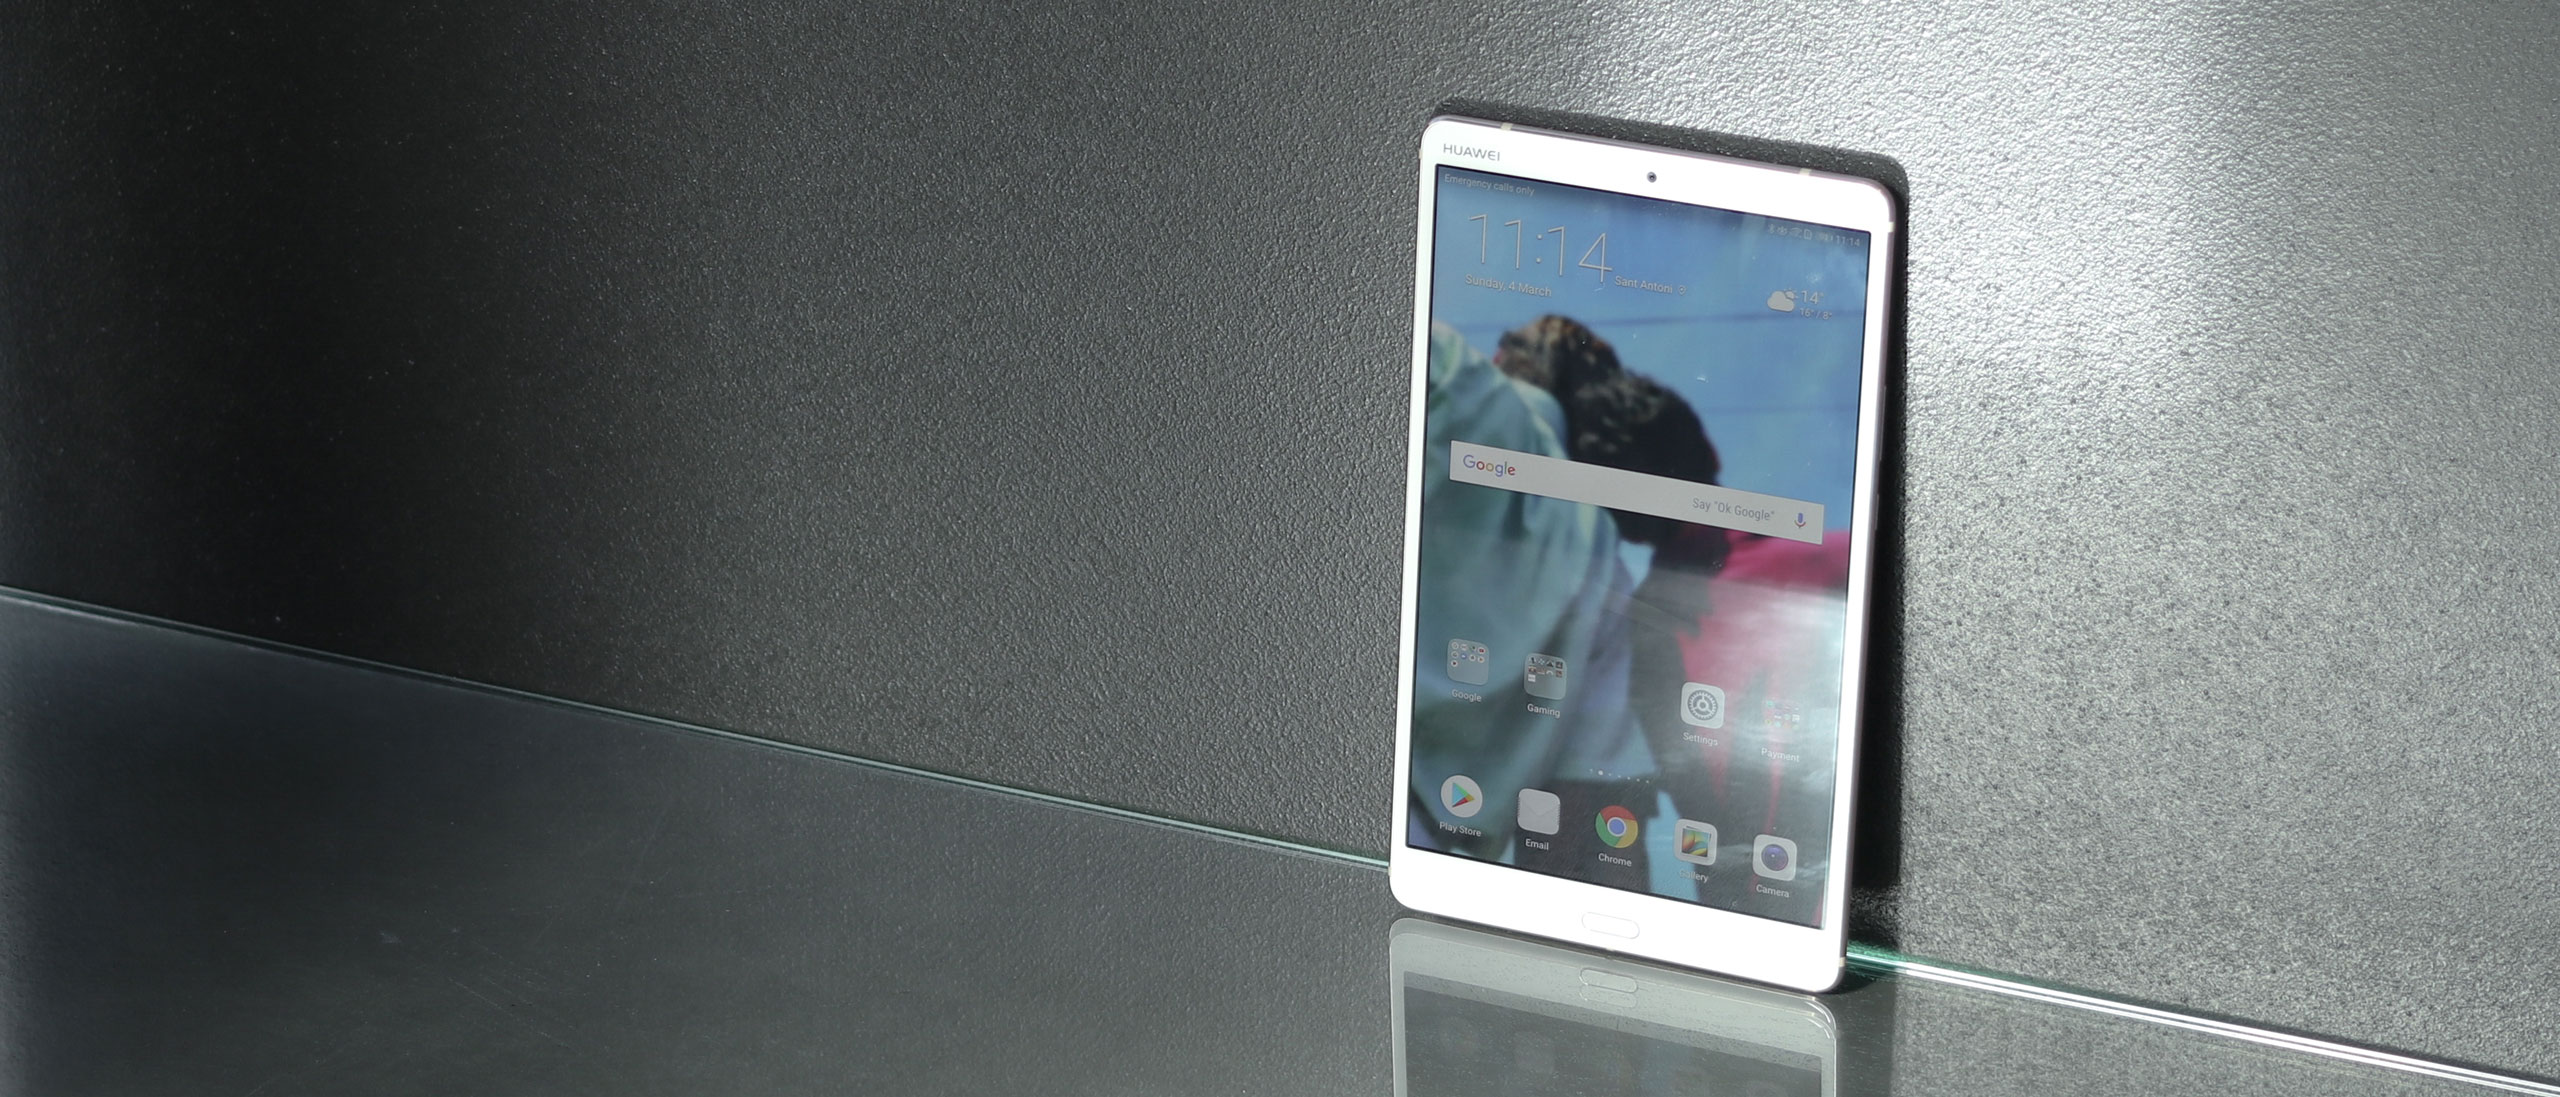 Huawei MediaPad M5 8 4 review | TechRadar